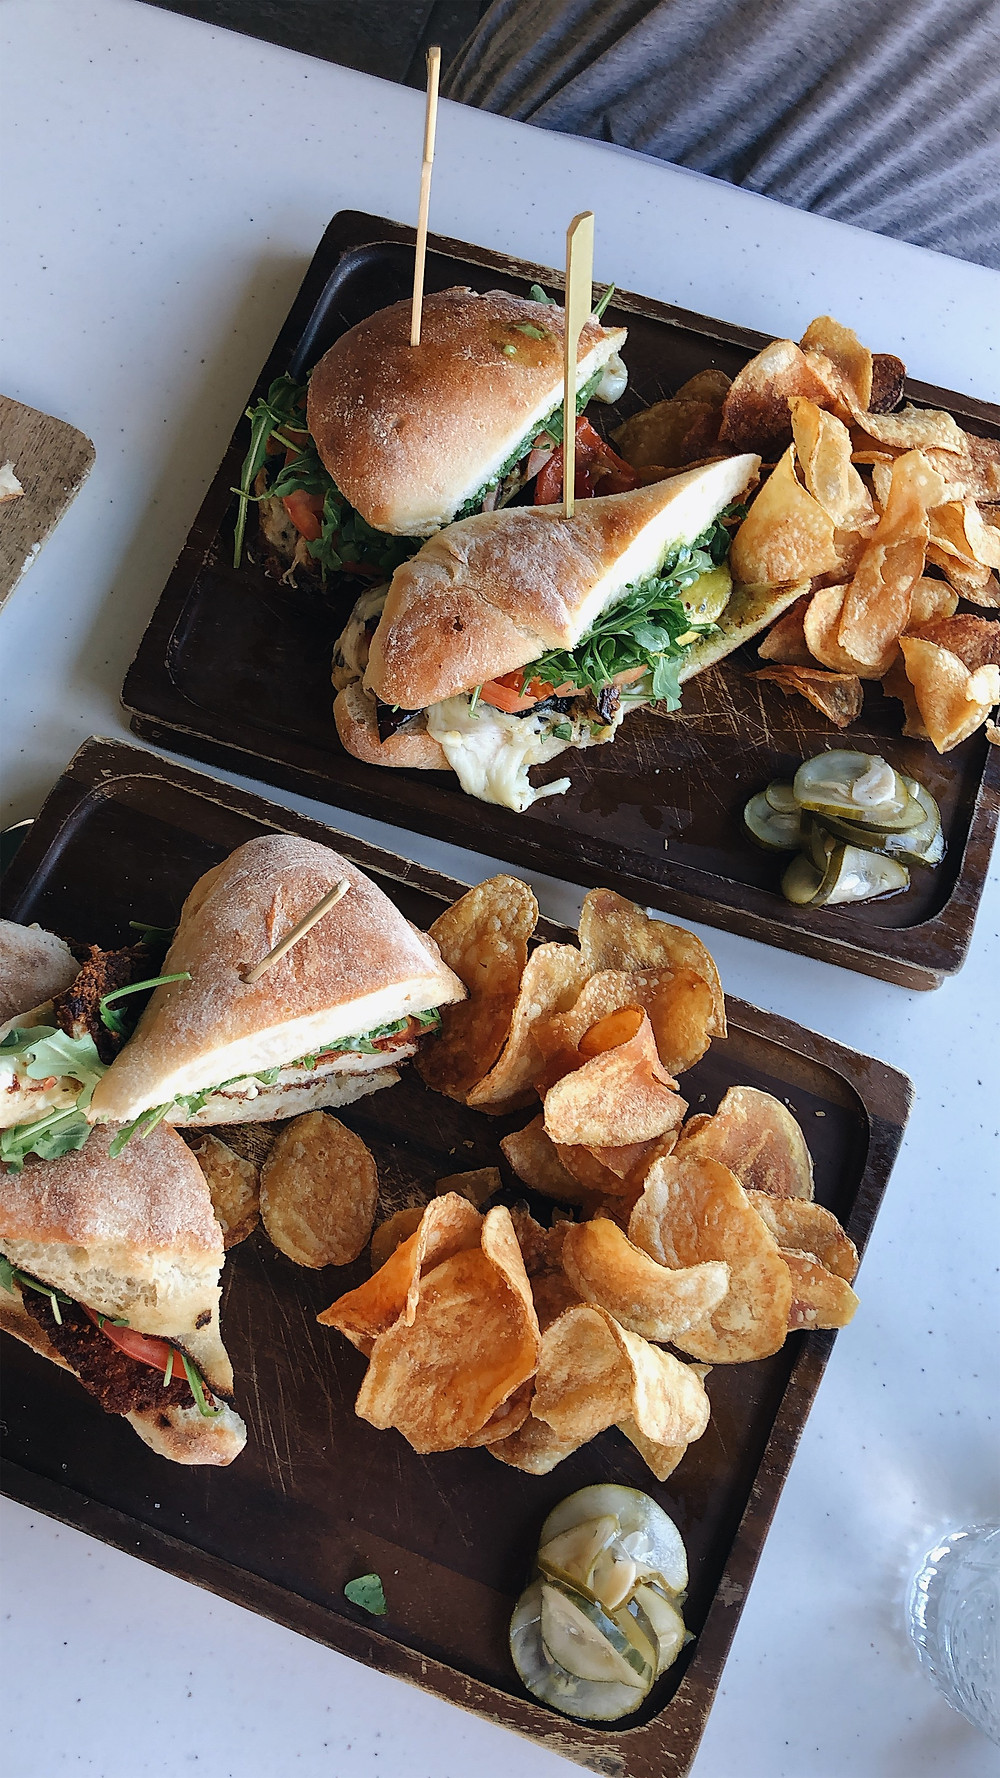 Terralina sandwiches, Abby Graf 2019